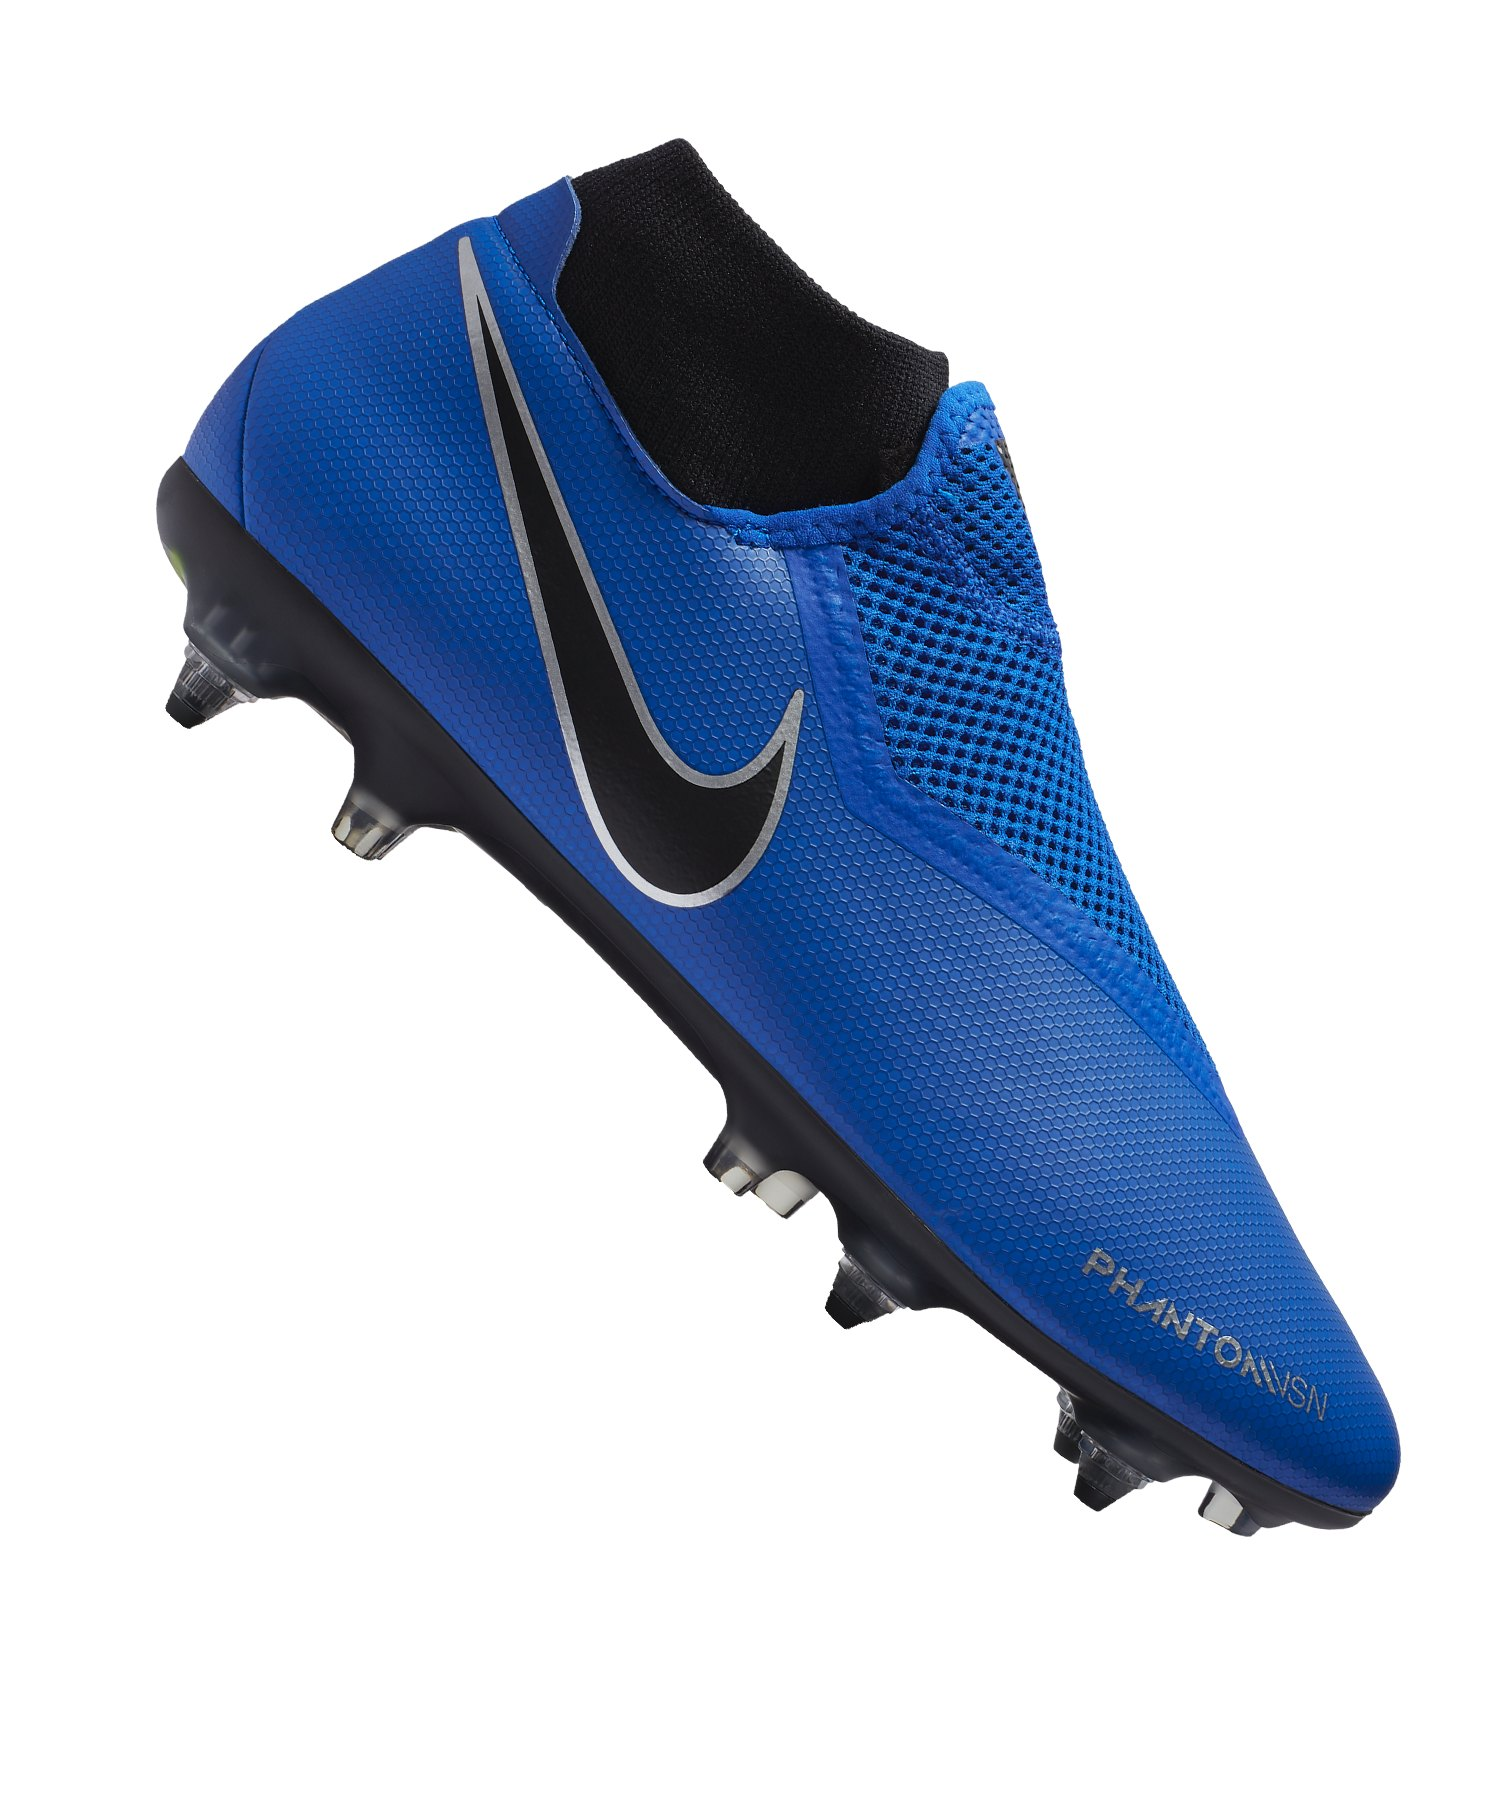 Nike Phantom Vision Academy DF SG-Pro AC F400 - blau